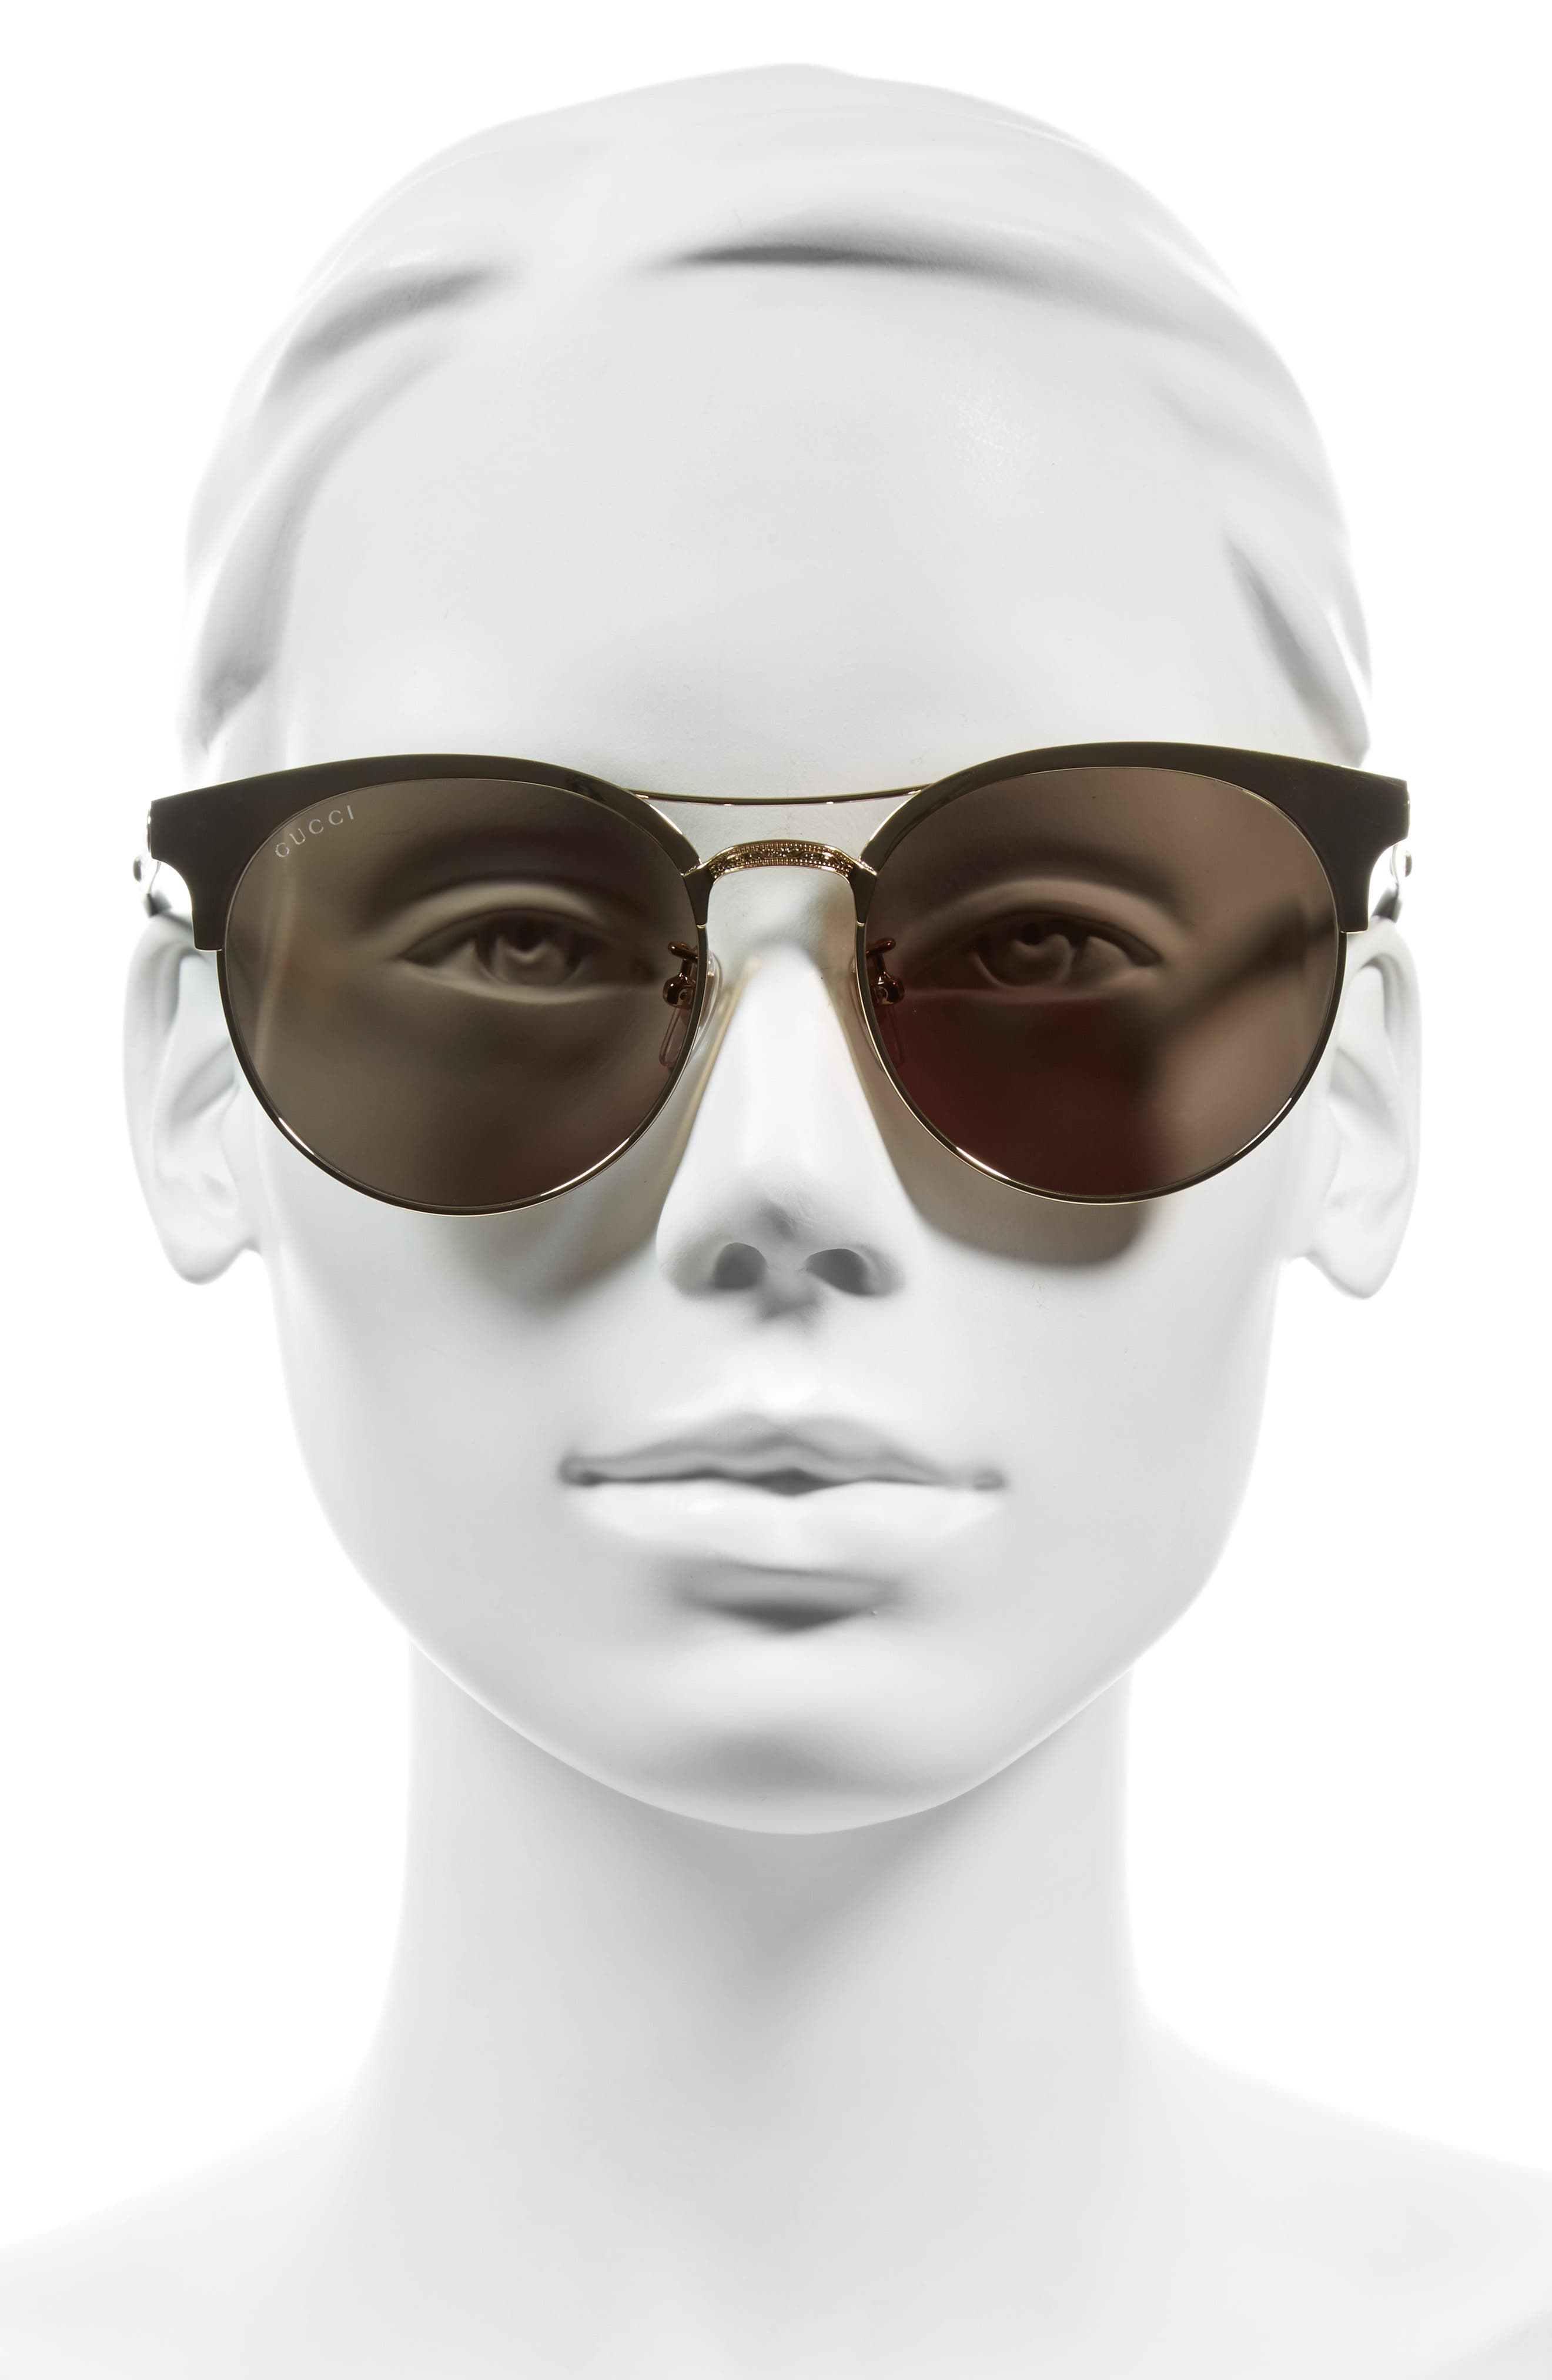 56mm Retro Sunglasses,                             Alternate thumbnail 5, color,